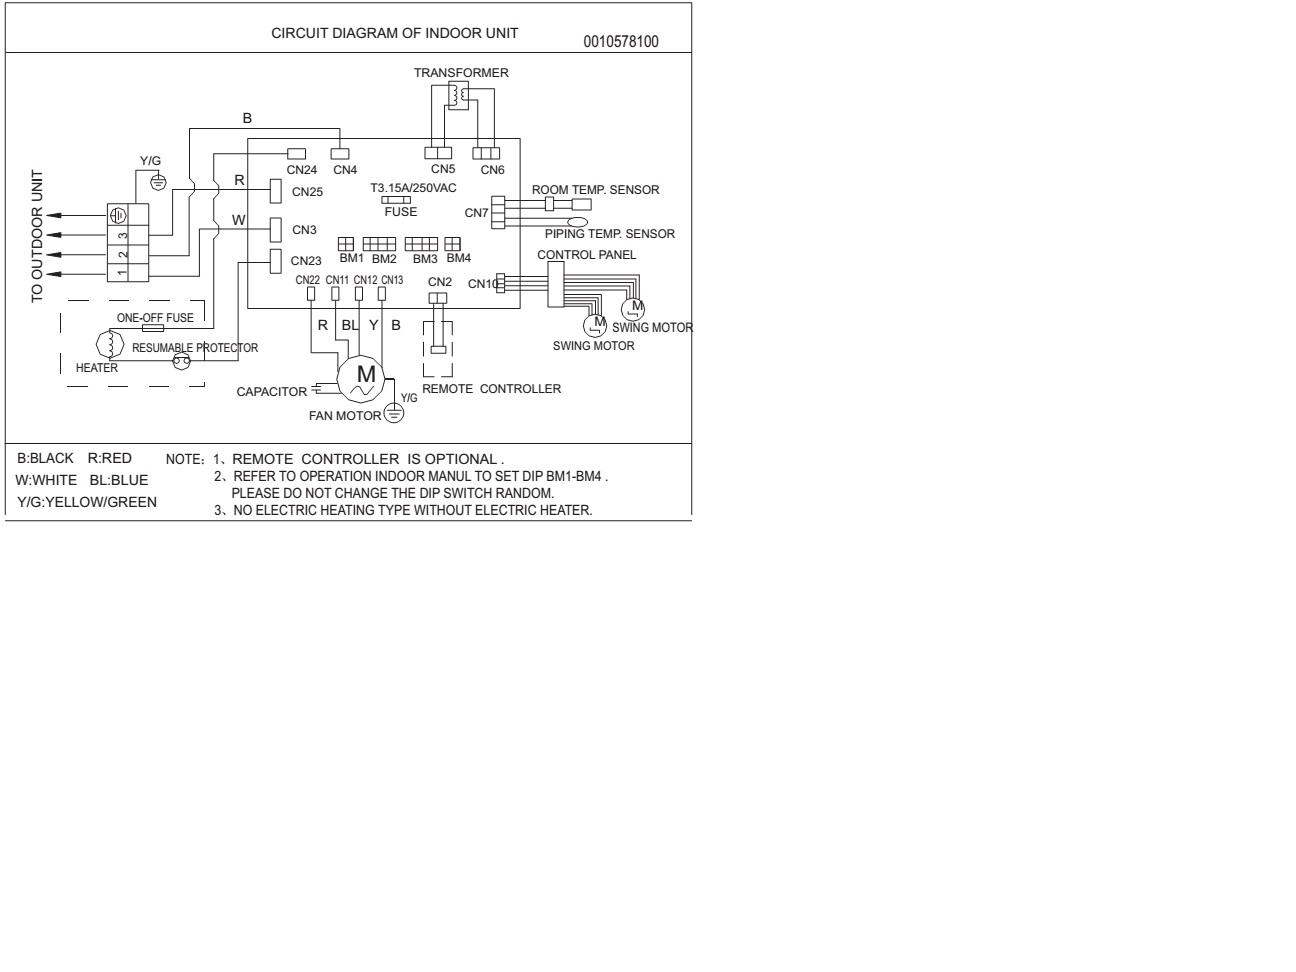 Hudson Diagrama De Cableado De Lavadora - Auto Electrical ... on dcs wiring diagram, manufacturing wiring diagram, estate wiring diagram, benq wiring diagram, broan wiring diagram, o2 wiring diagram, msi wiring diagram, foscam wiring diagram, toshiba wiring diagram, crosley wiring diagram, apc wiring diagram, roper wiring diagram, panasonic wiring diagram, apple wiring diagram, vivitar wiring diagram, danby wiring diagram, midea wiring diagram, sears wiring diagram, viking wiring diagram, braun wiring diagram,